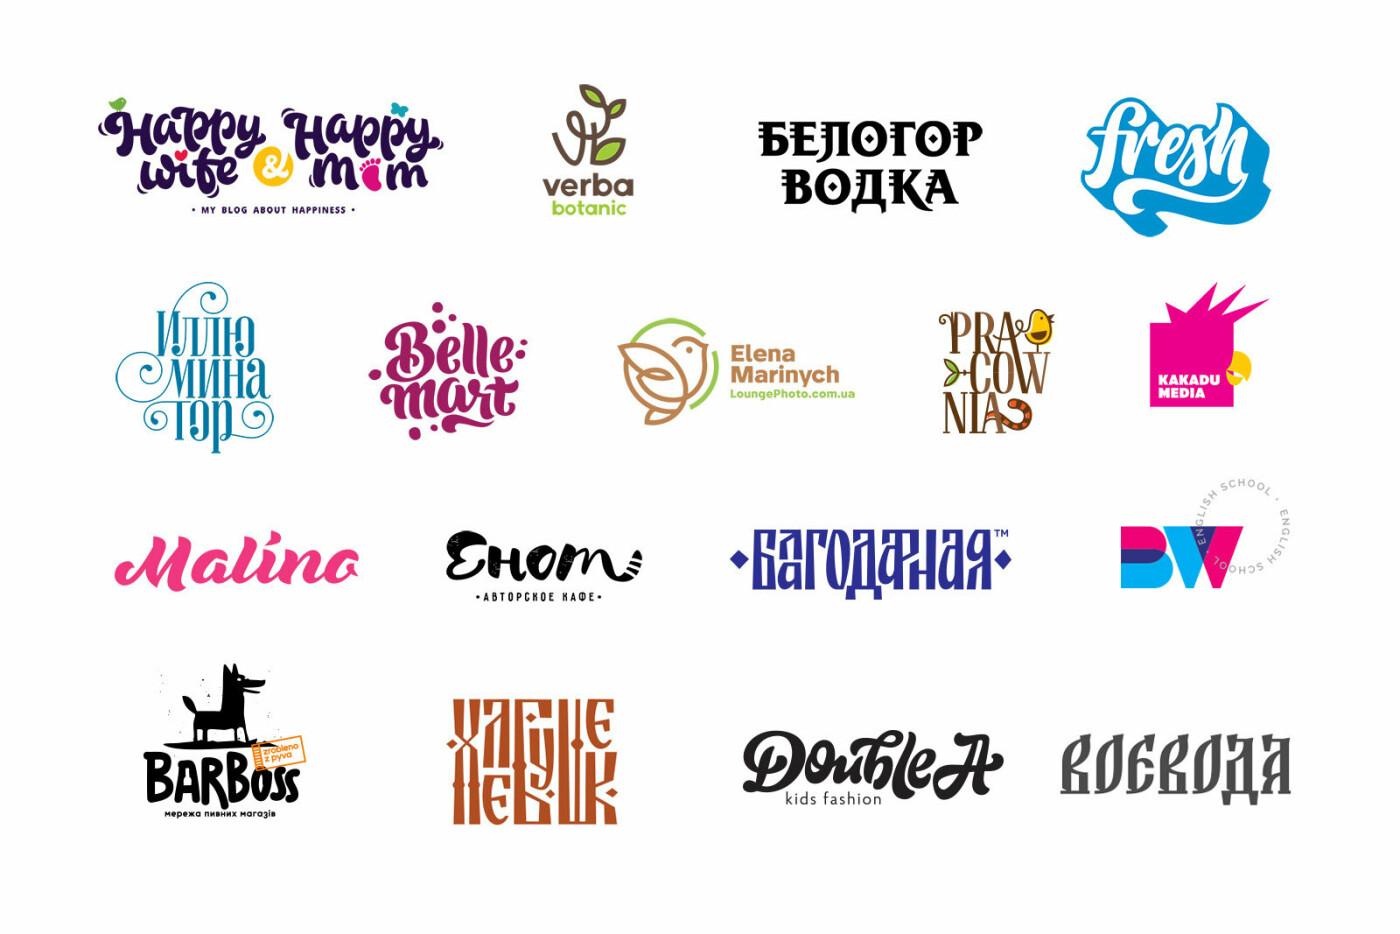 Наталья Белоусова: «Дизайн — это работа без границ», фото-16, Наталья Белоусова